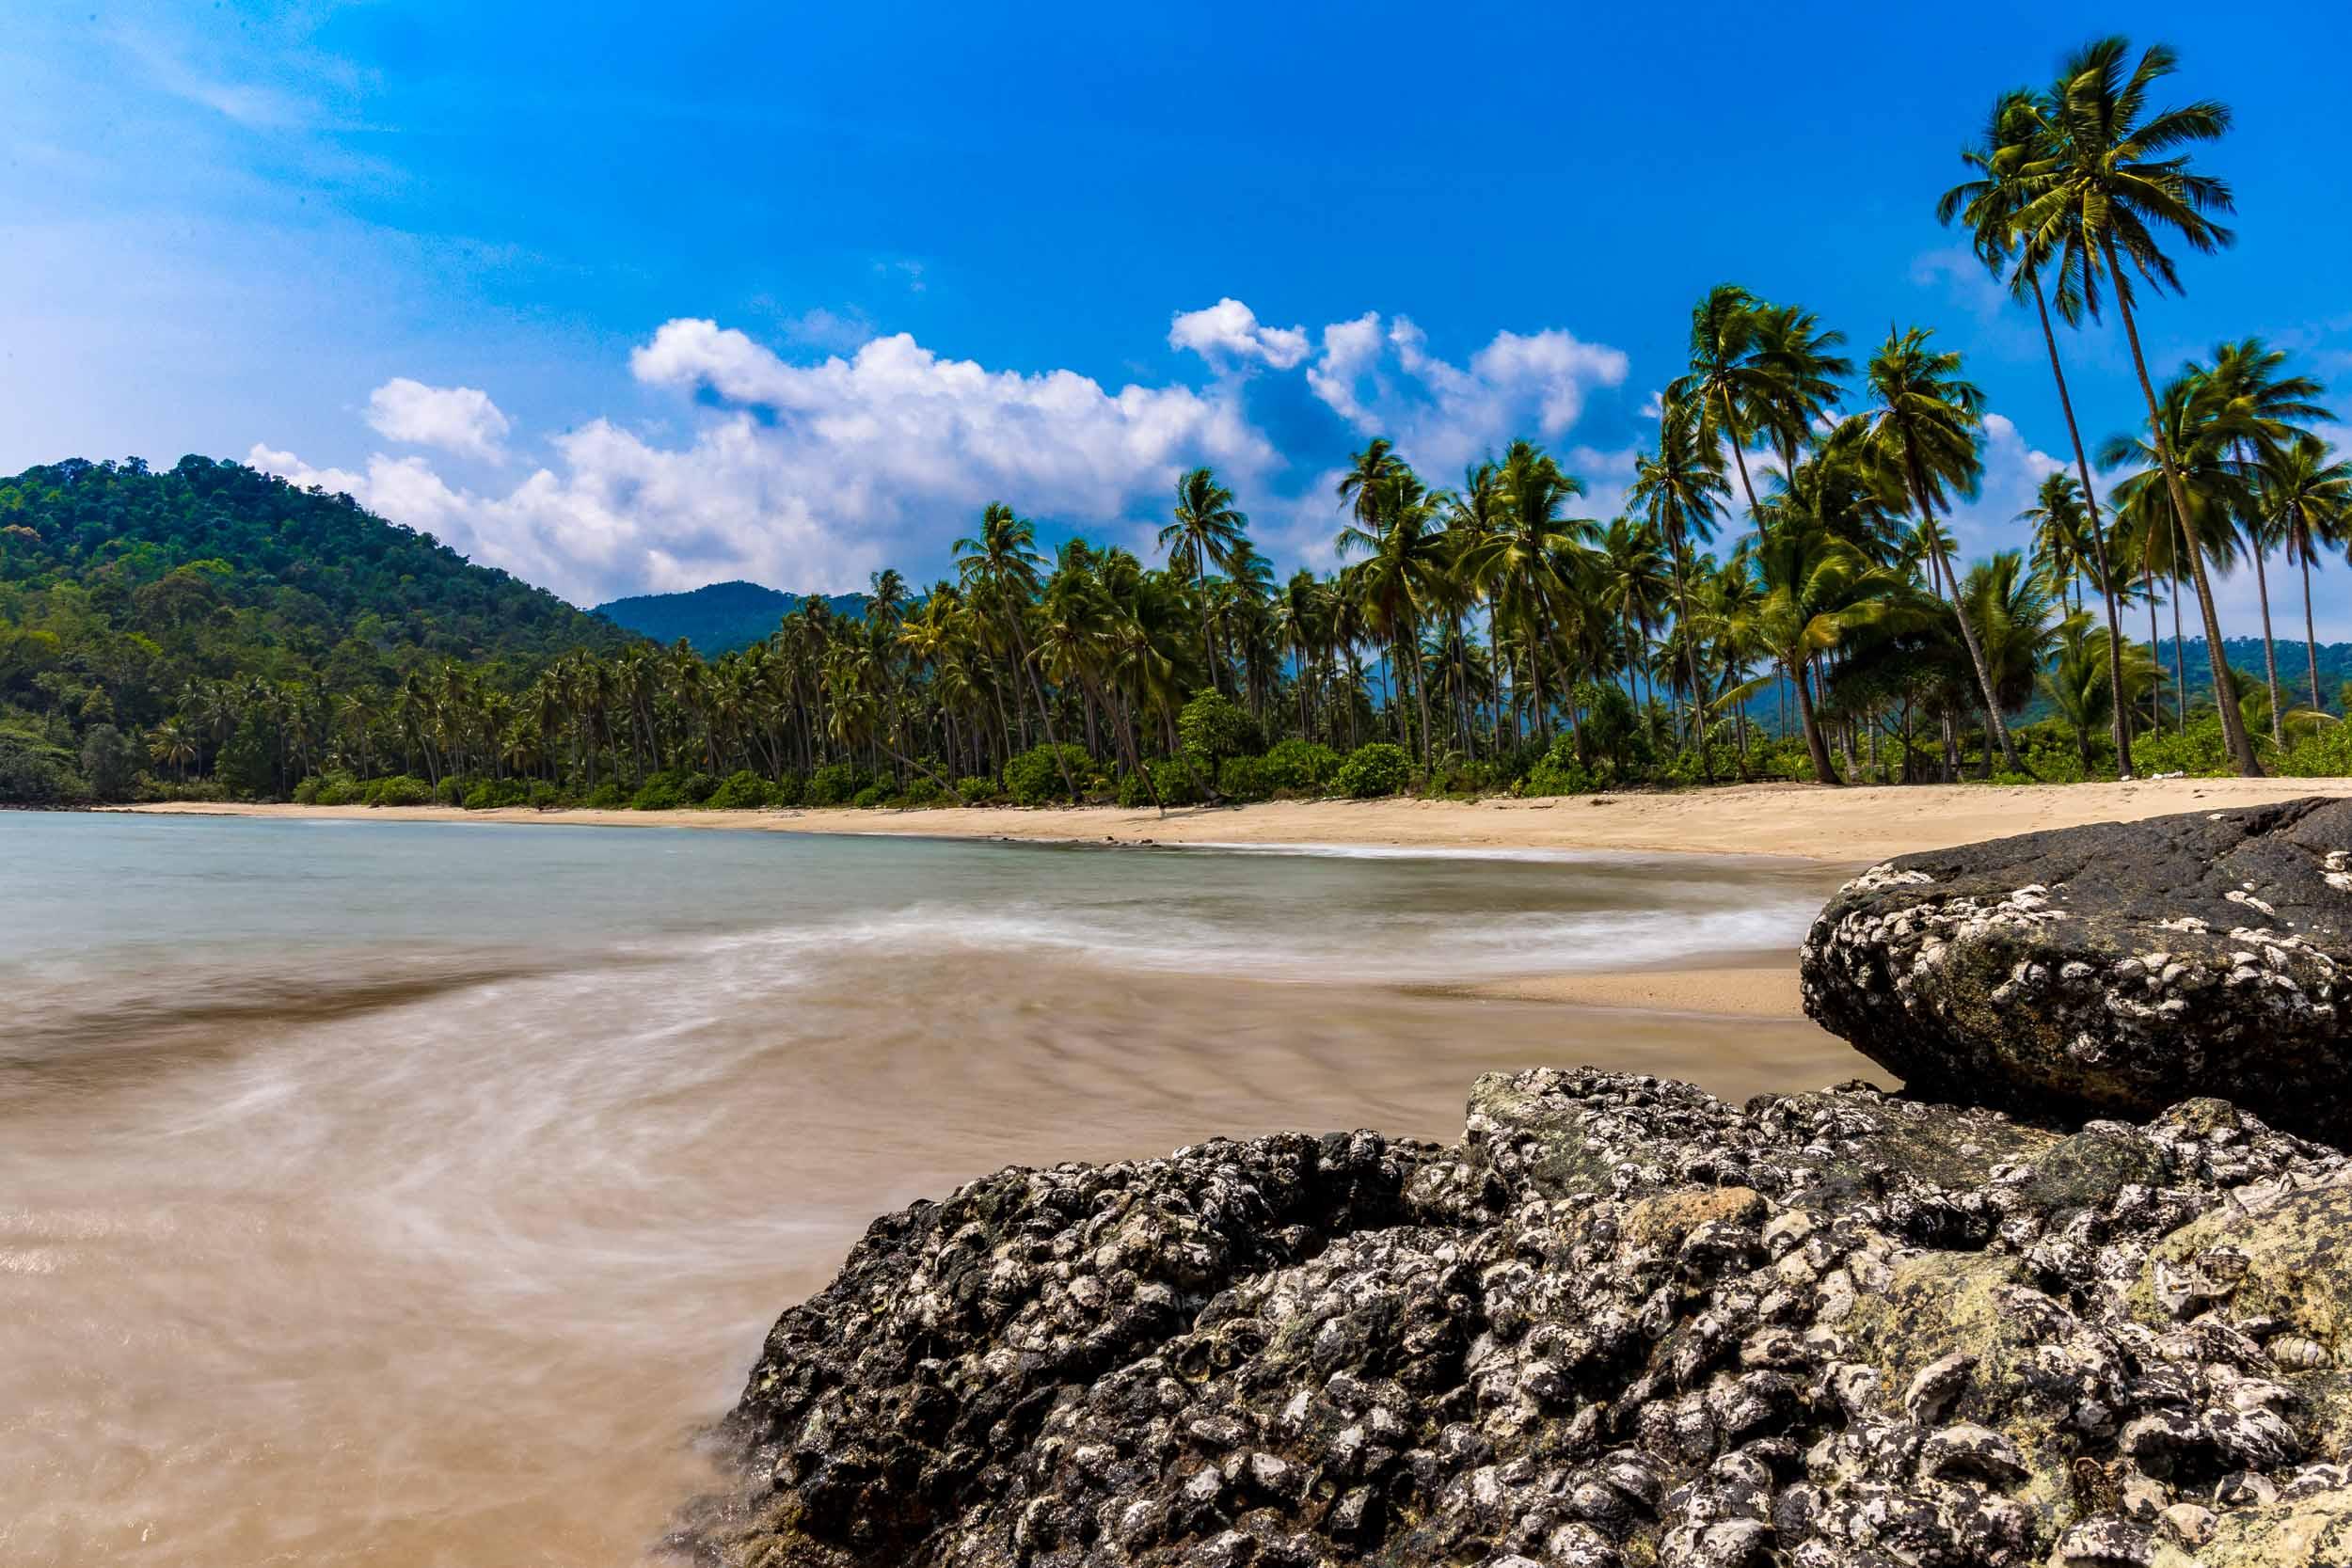 Rupert Turkington Travel Photography - Wai Chek Beach, Koh Chang, Thailand